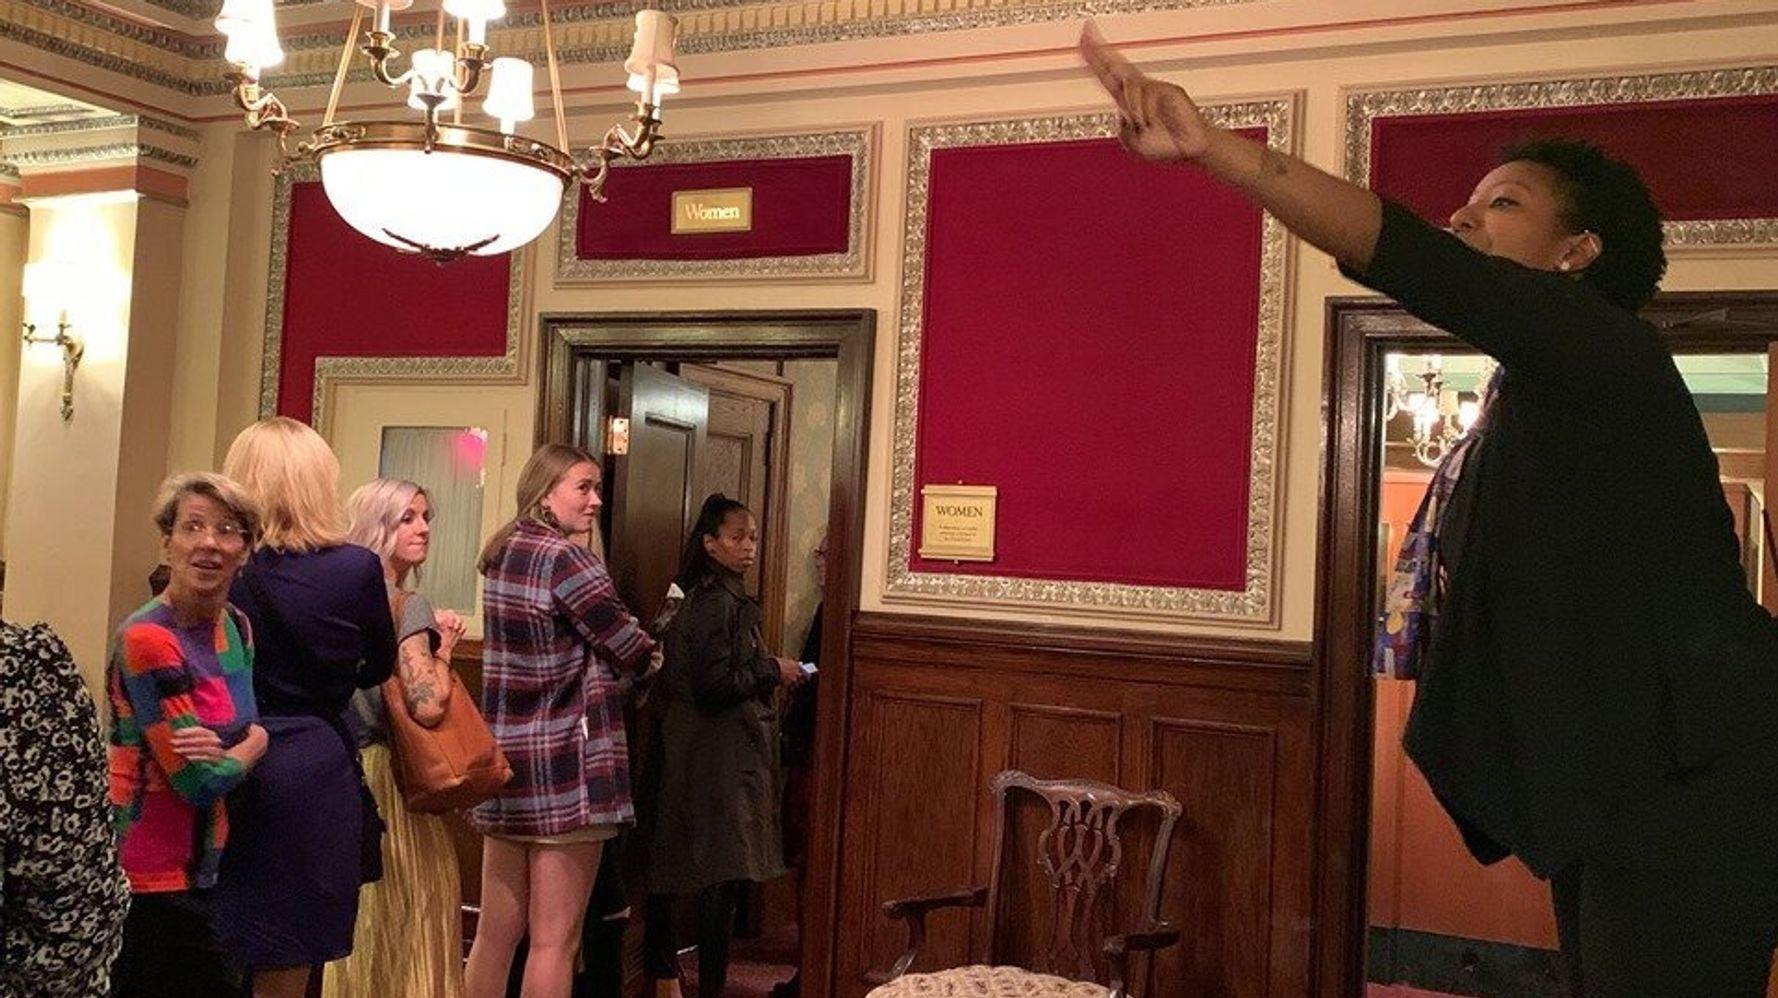 Usher Who Heroically Keeps Colossal 'Hamilton' Bathroom Line Moving Becomes Viral Star